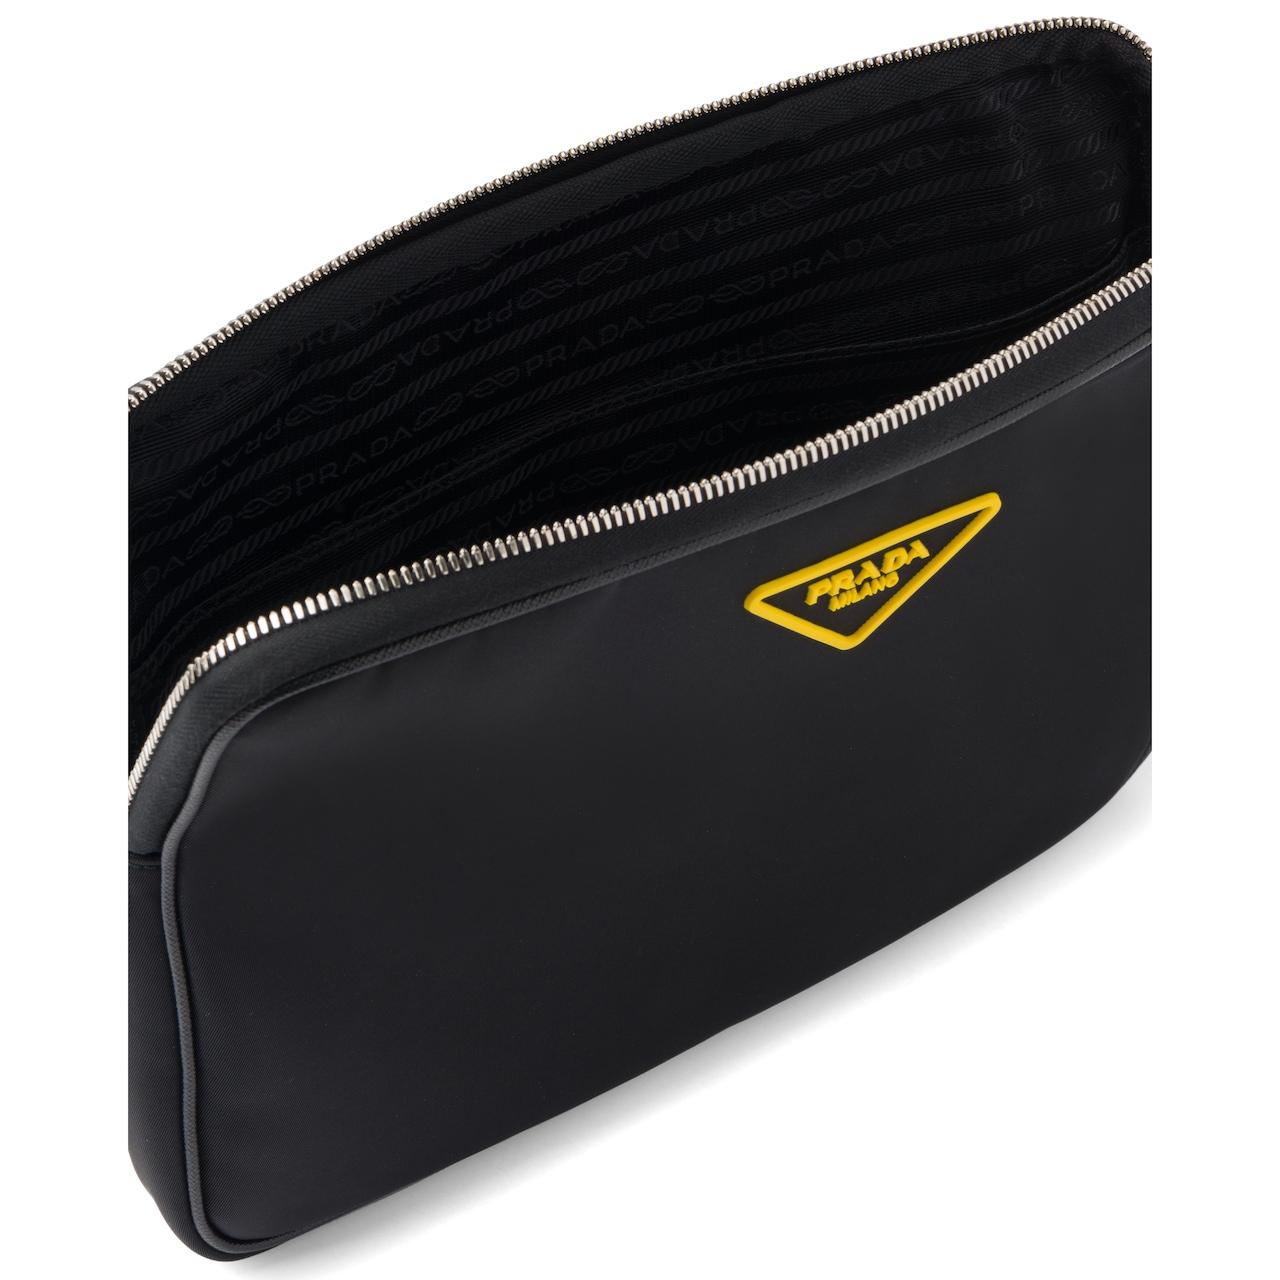 Prada Nylon shoulder bag 5